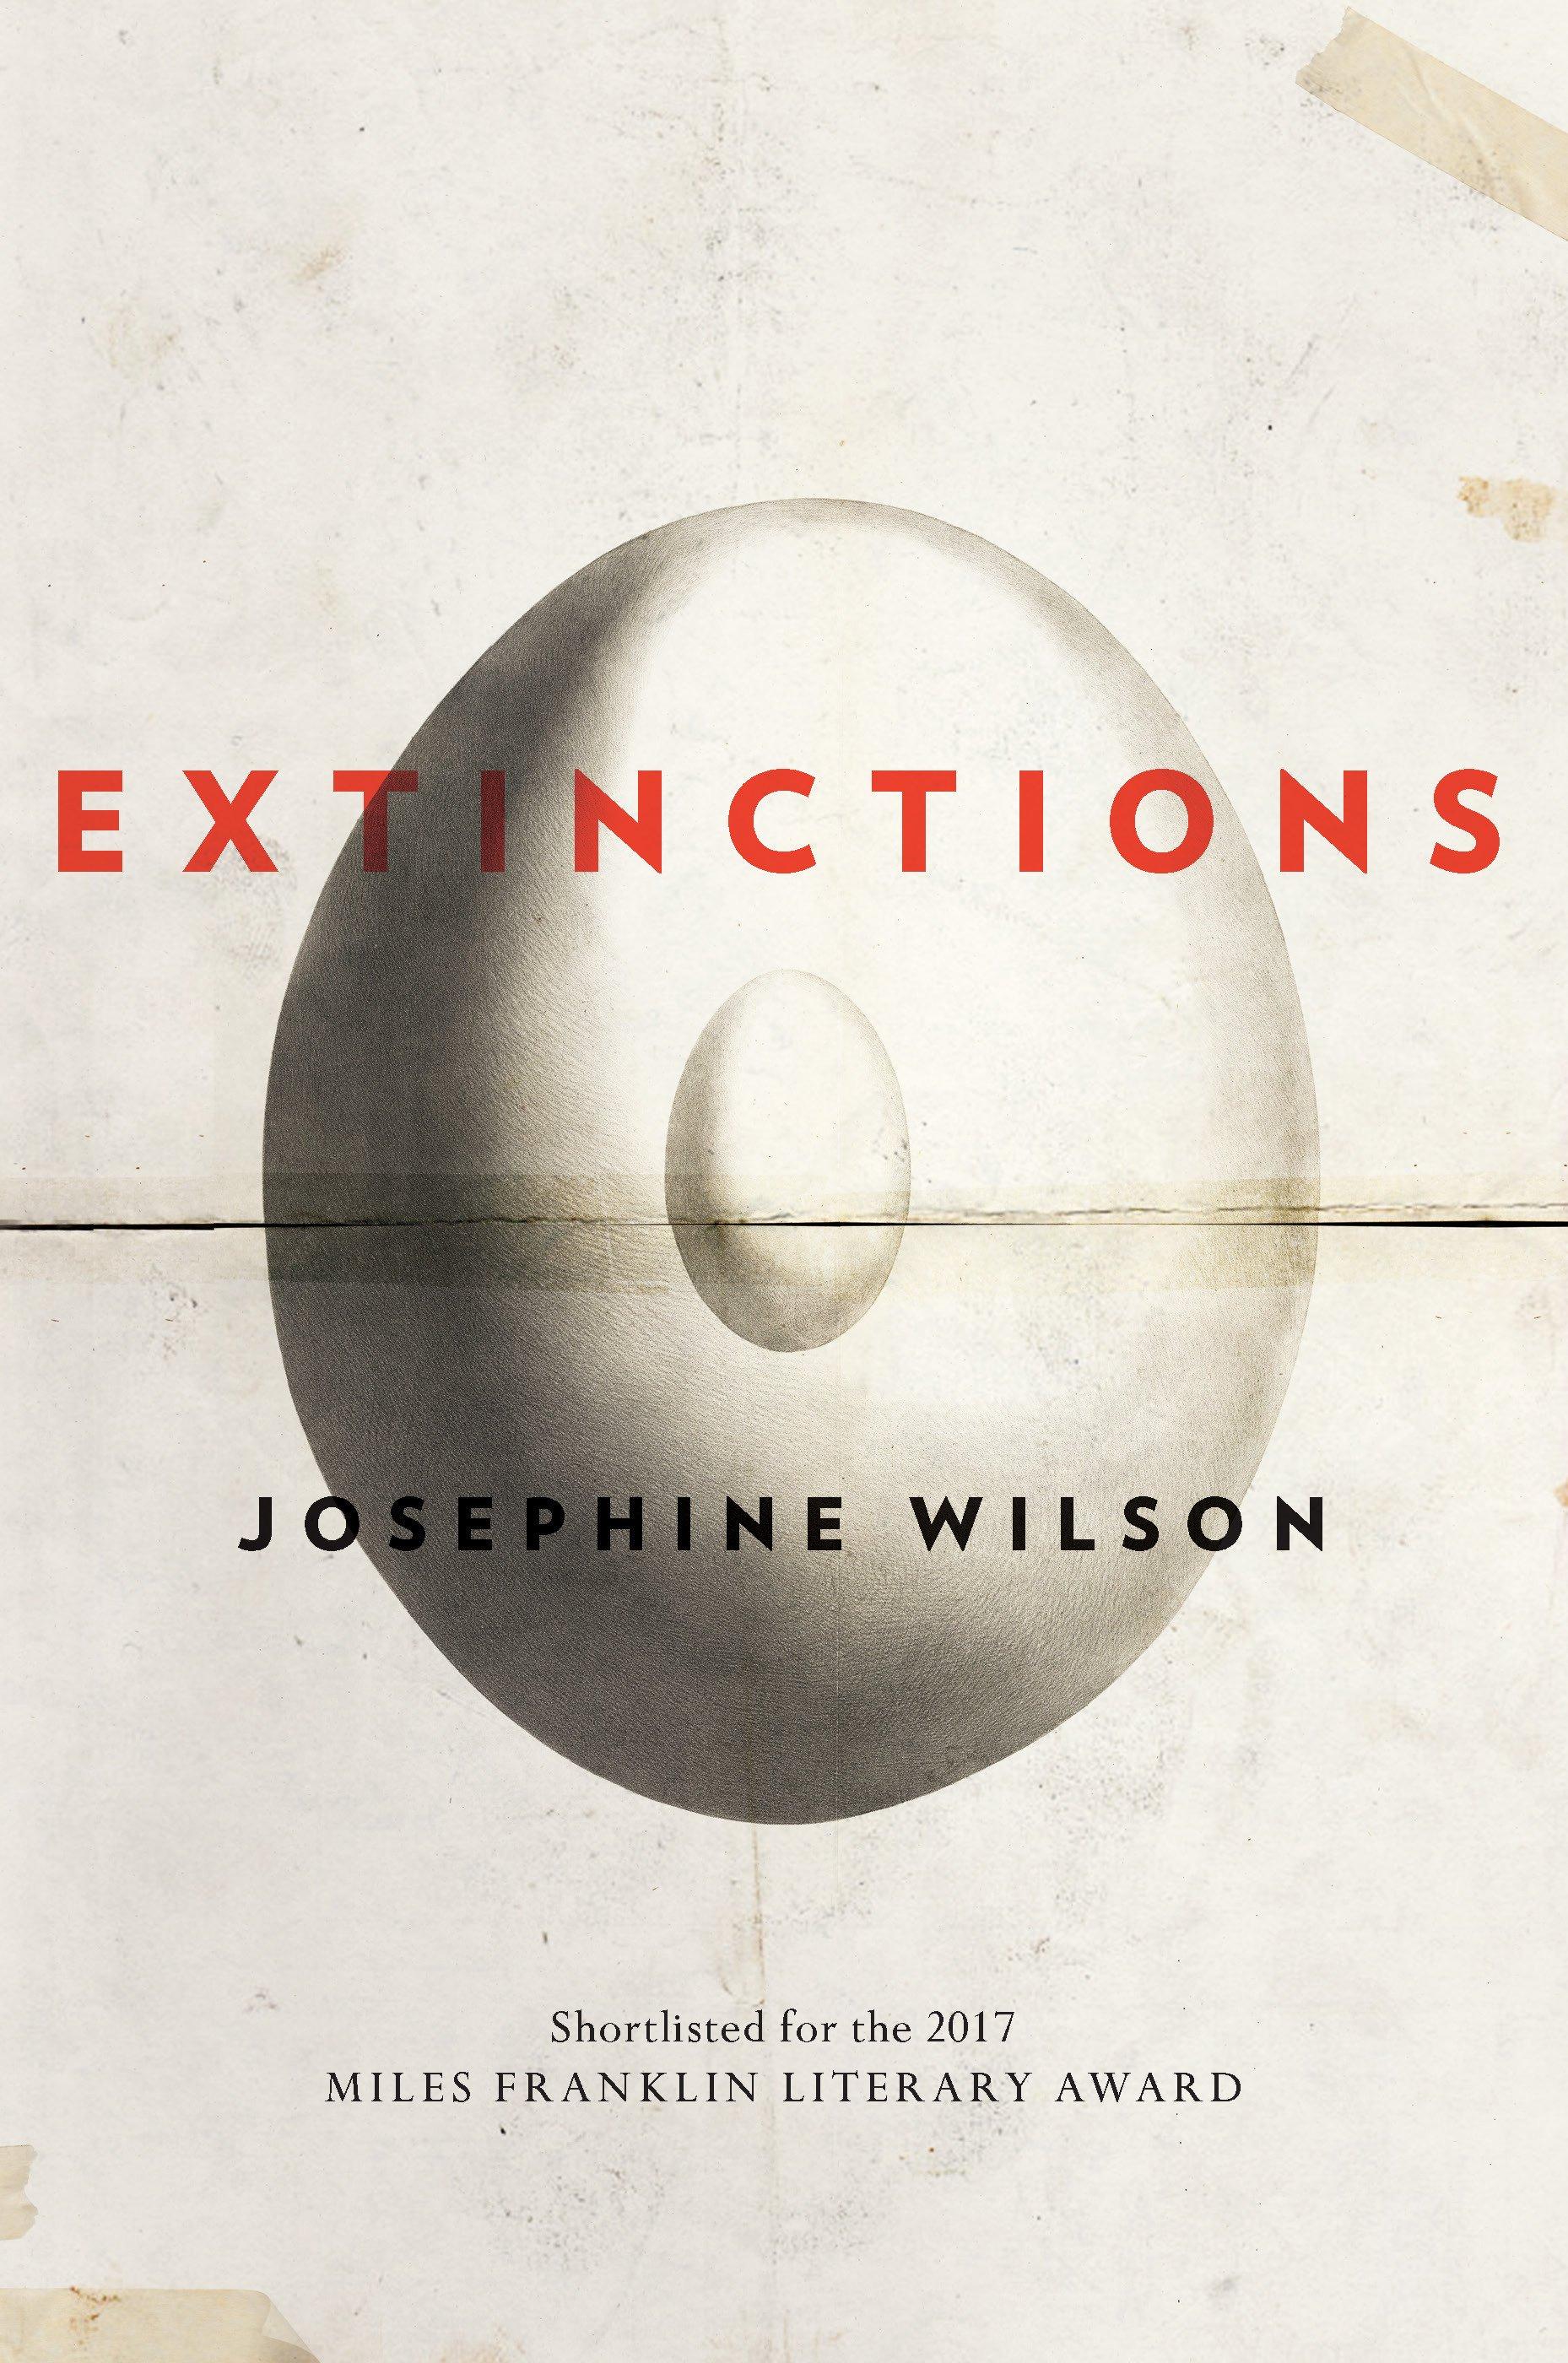 If you enjoyed reading Extinctions by Josephine Wilson...